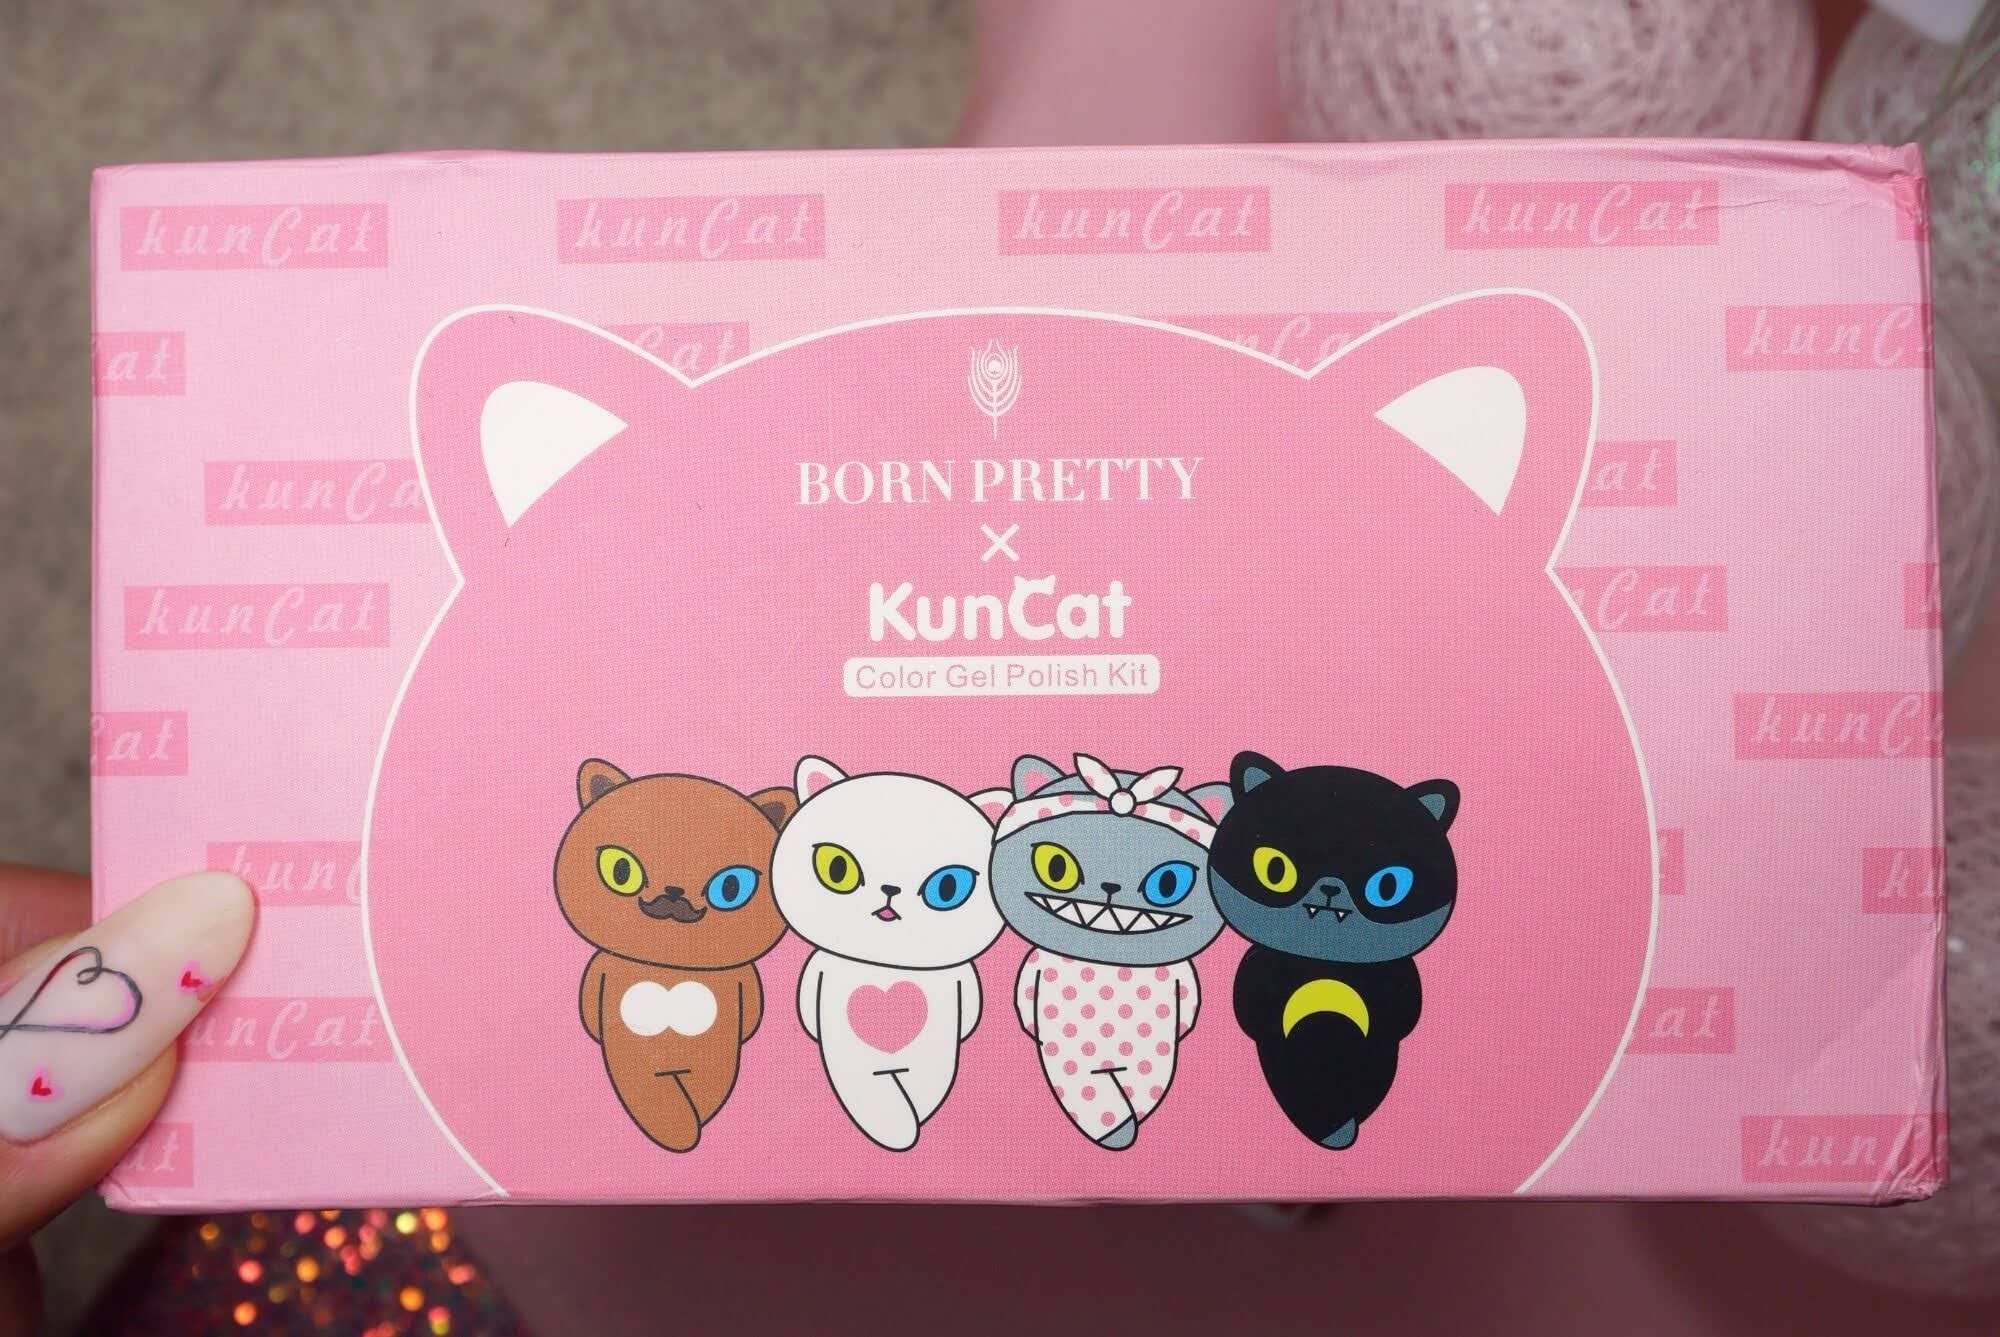 Kuncat hybrydy - Born Pretty